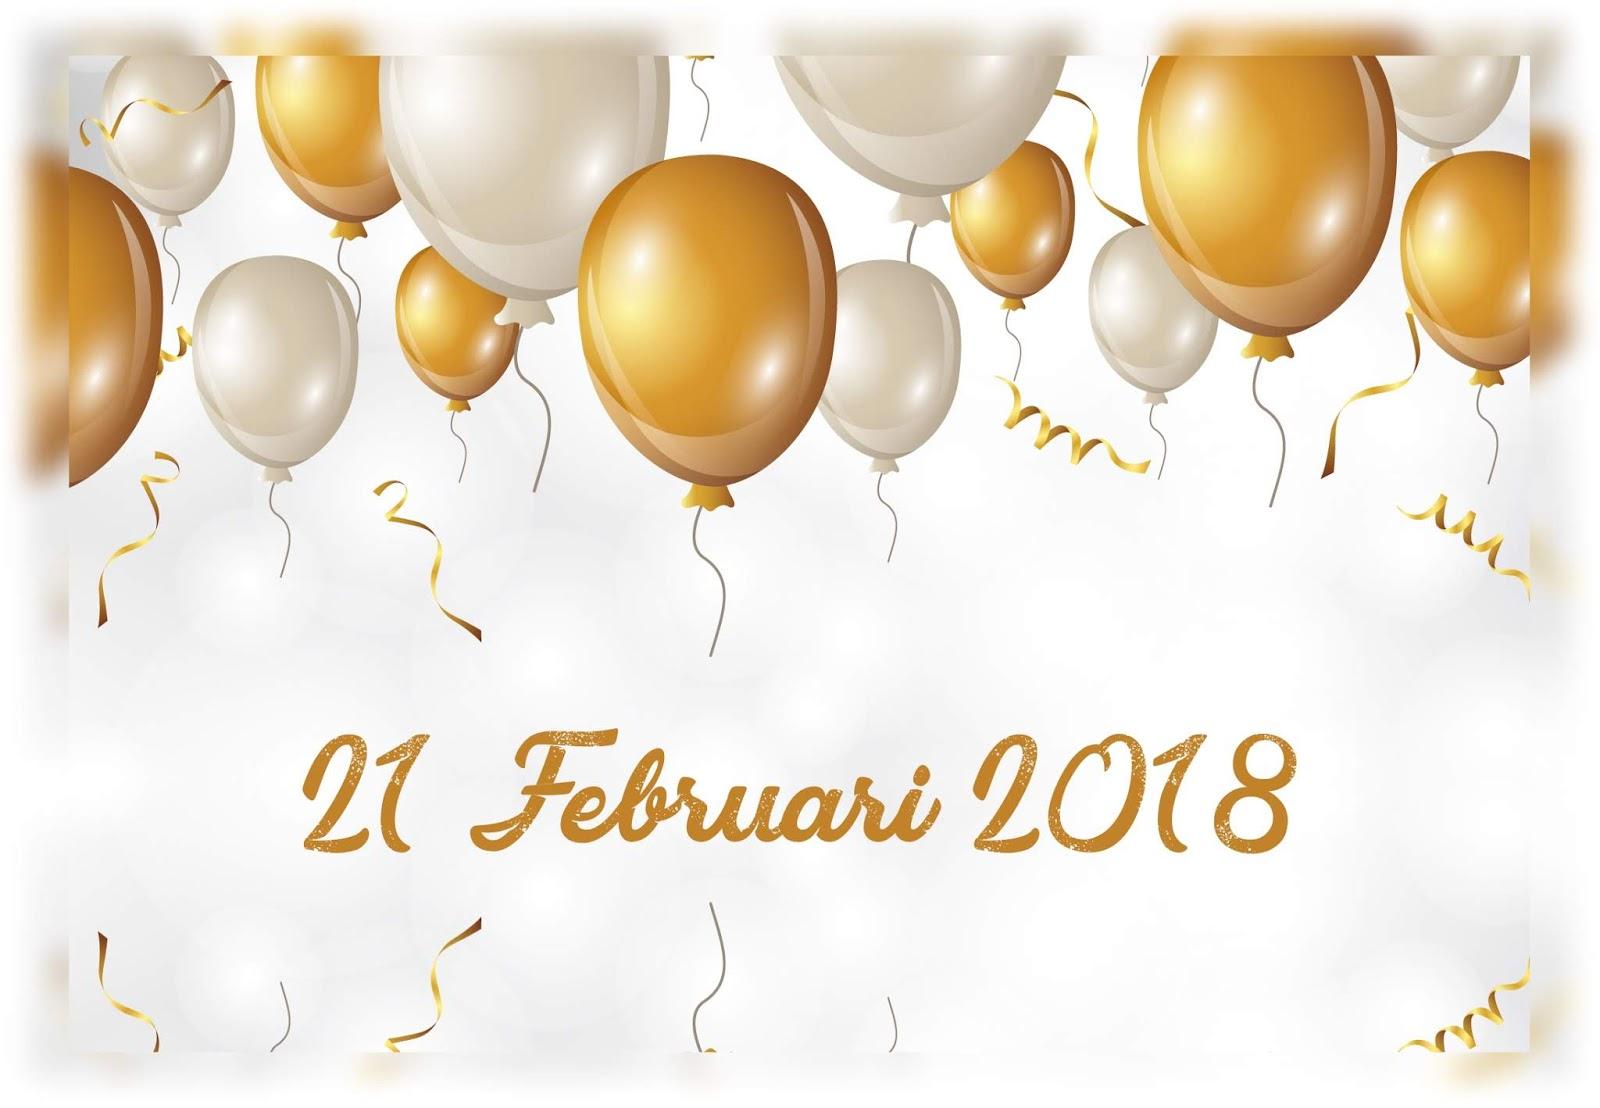 21 Februari 2018